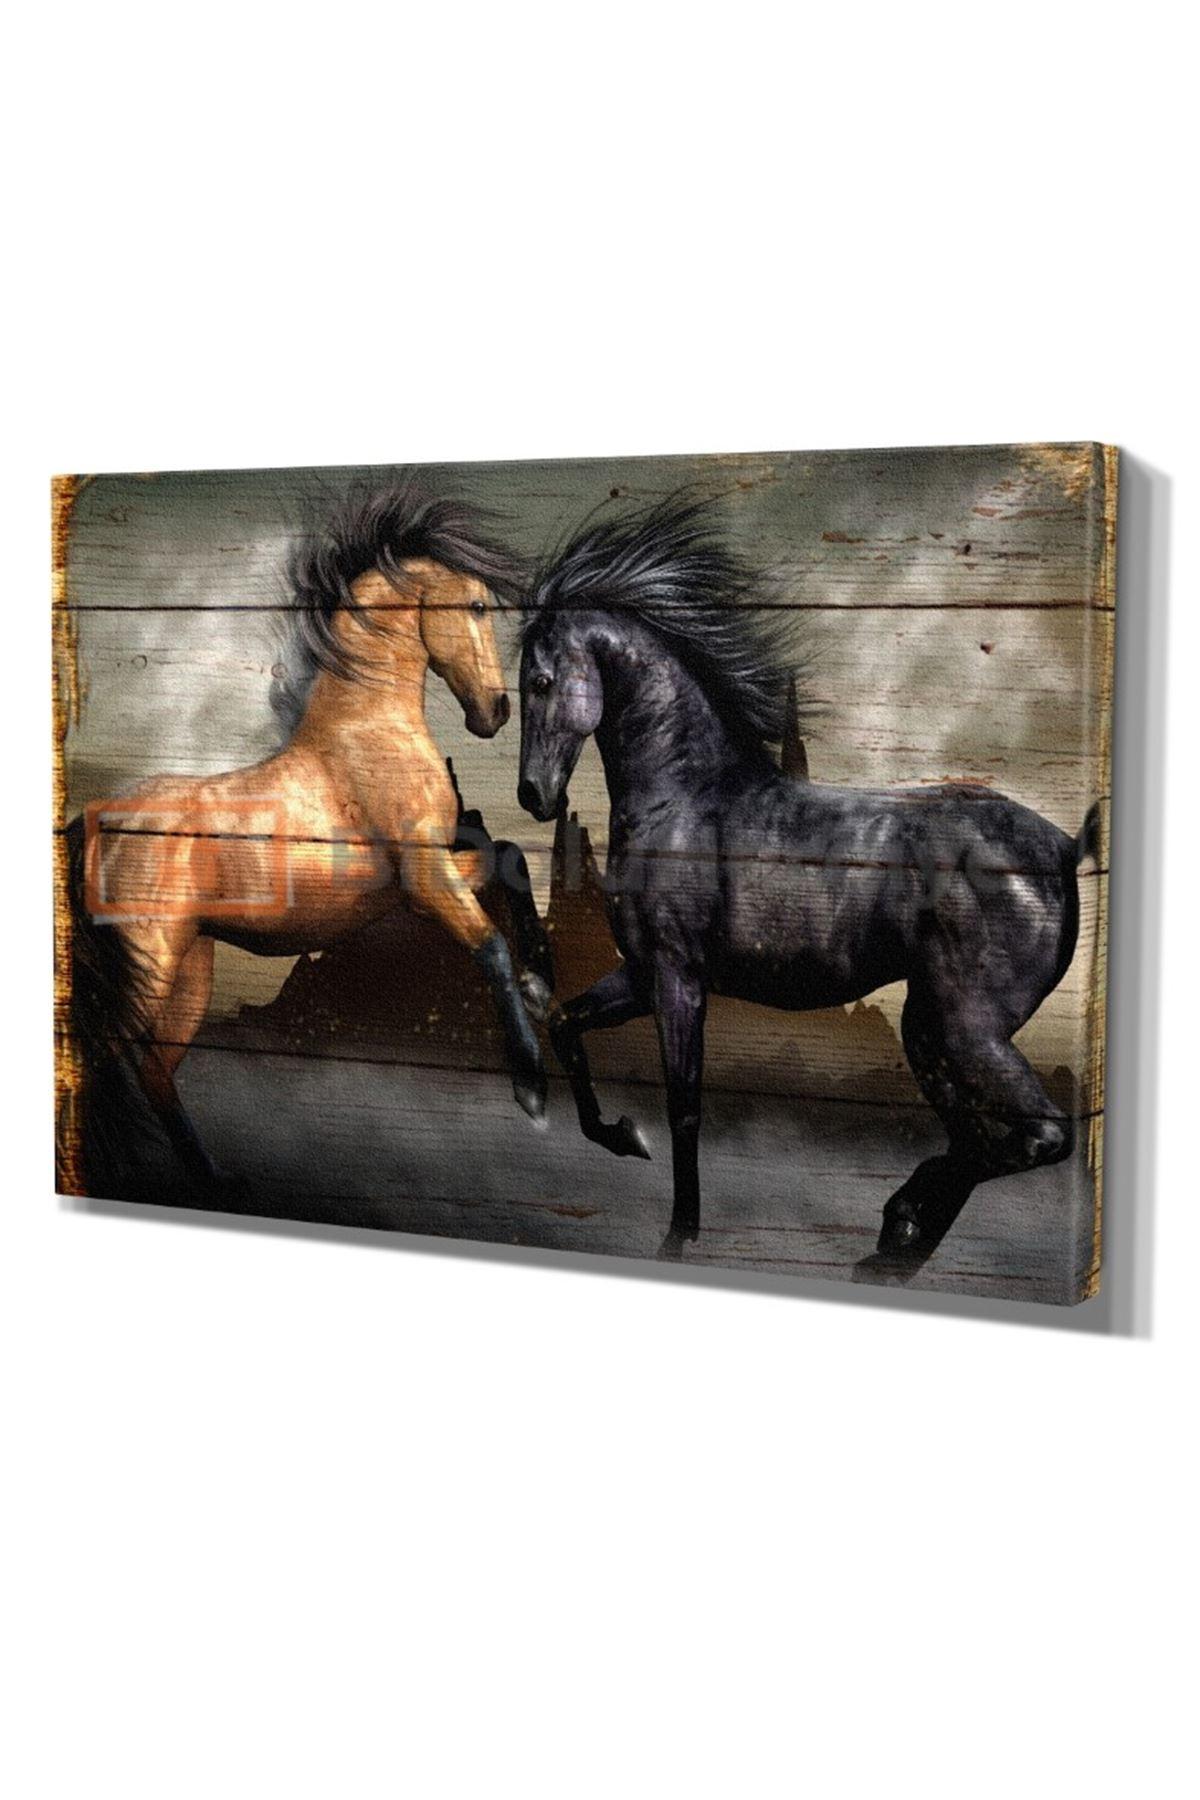 DİJİTAL BASKI AT (HORSE) TABLO